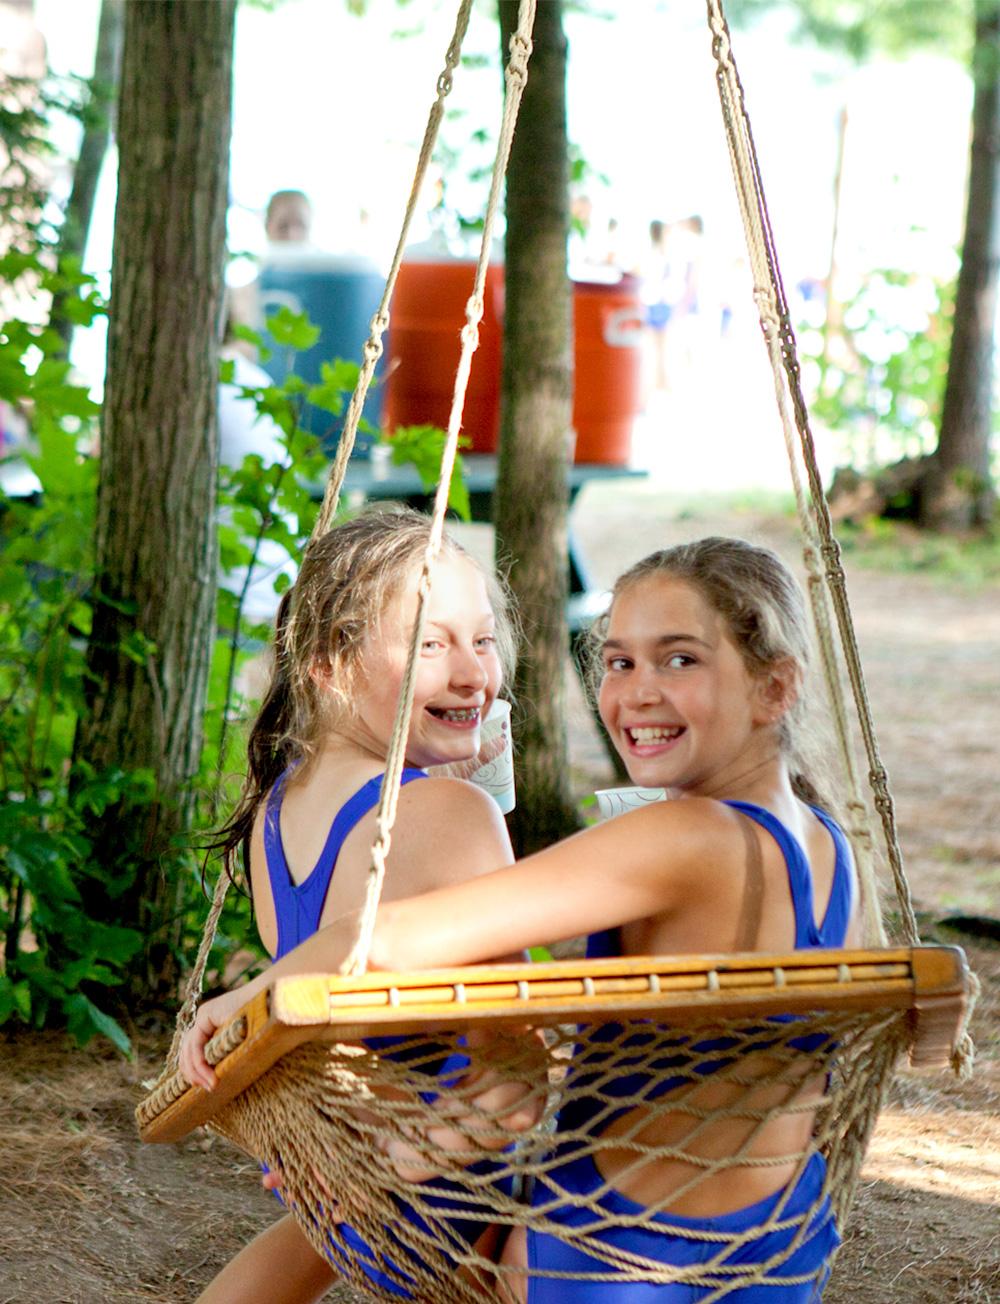 A Maine Camp, A Family-Run Camp, An all Girls Camp - Camp